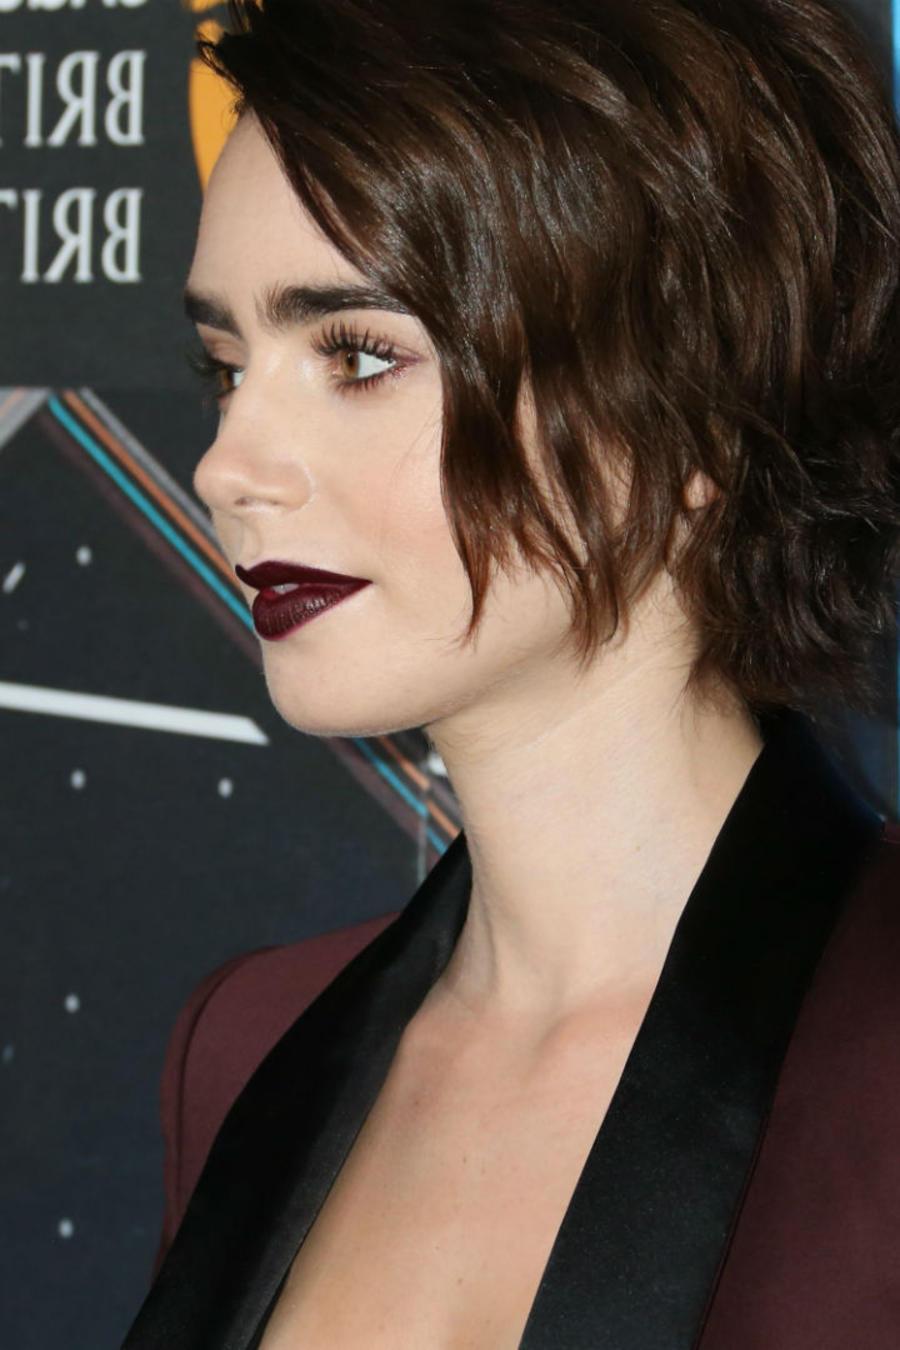 Lily Collins con cabello corto y blazer guinda